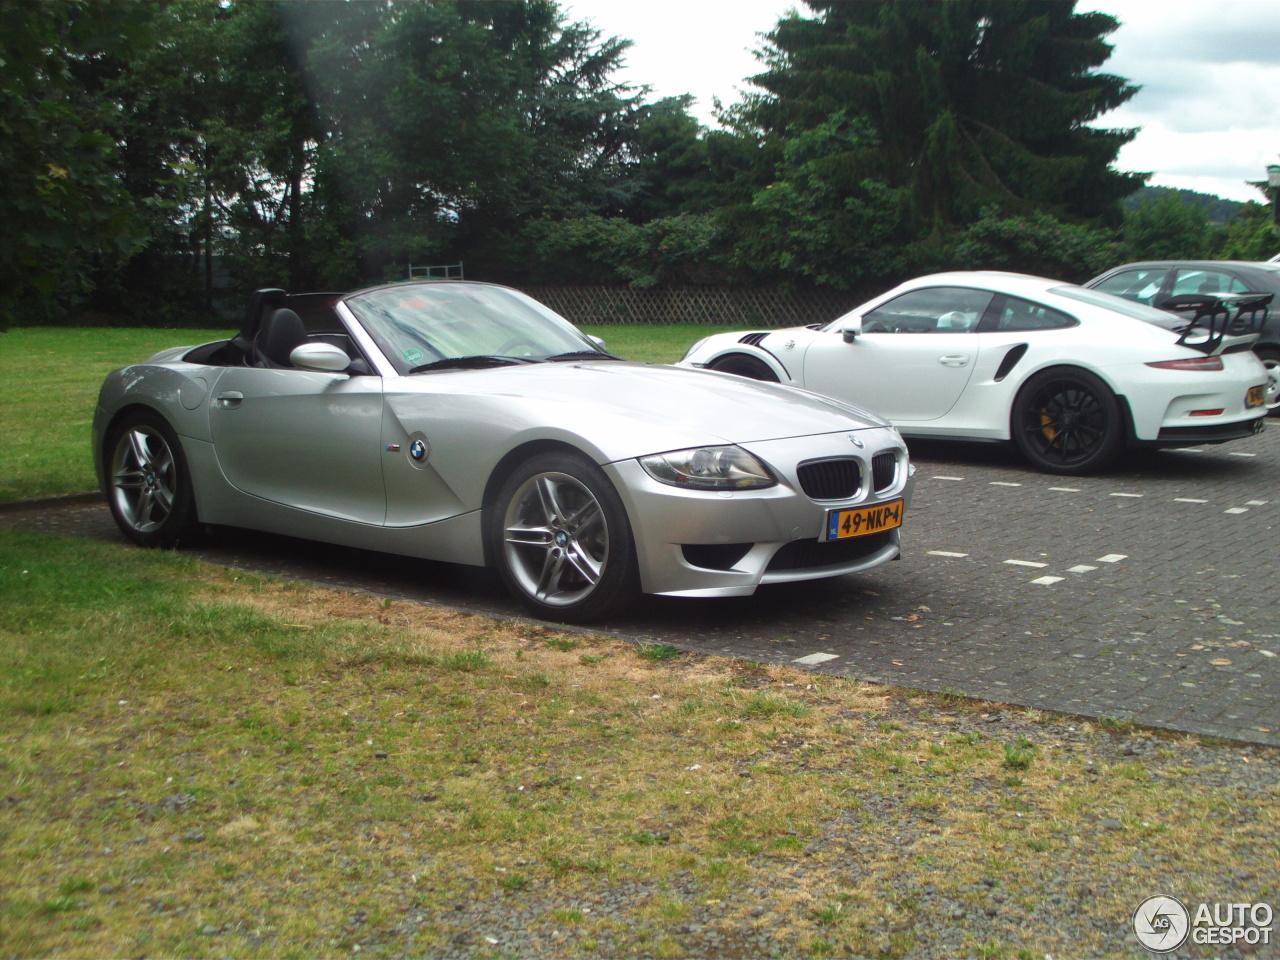 Bmw Z4 M Roadster 18 Juli 2016 Autogespot